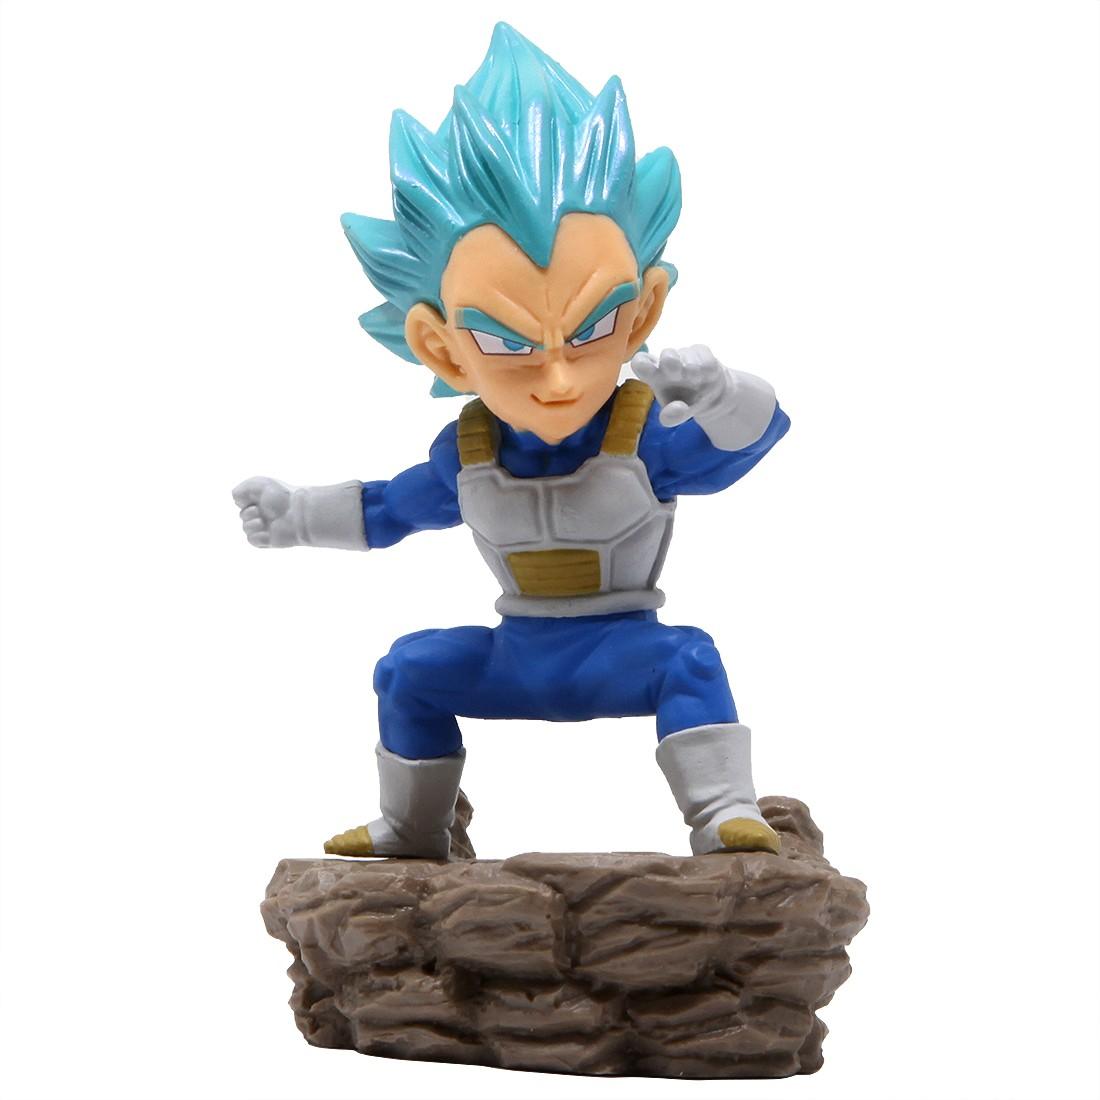 Banpresto Dragon Ball Super World Collectable Diorama Vol. 3 - 12 Super Saiyan Blue Vegeta Figure (blue)